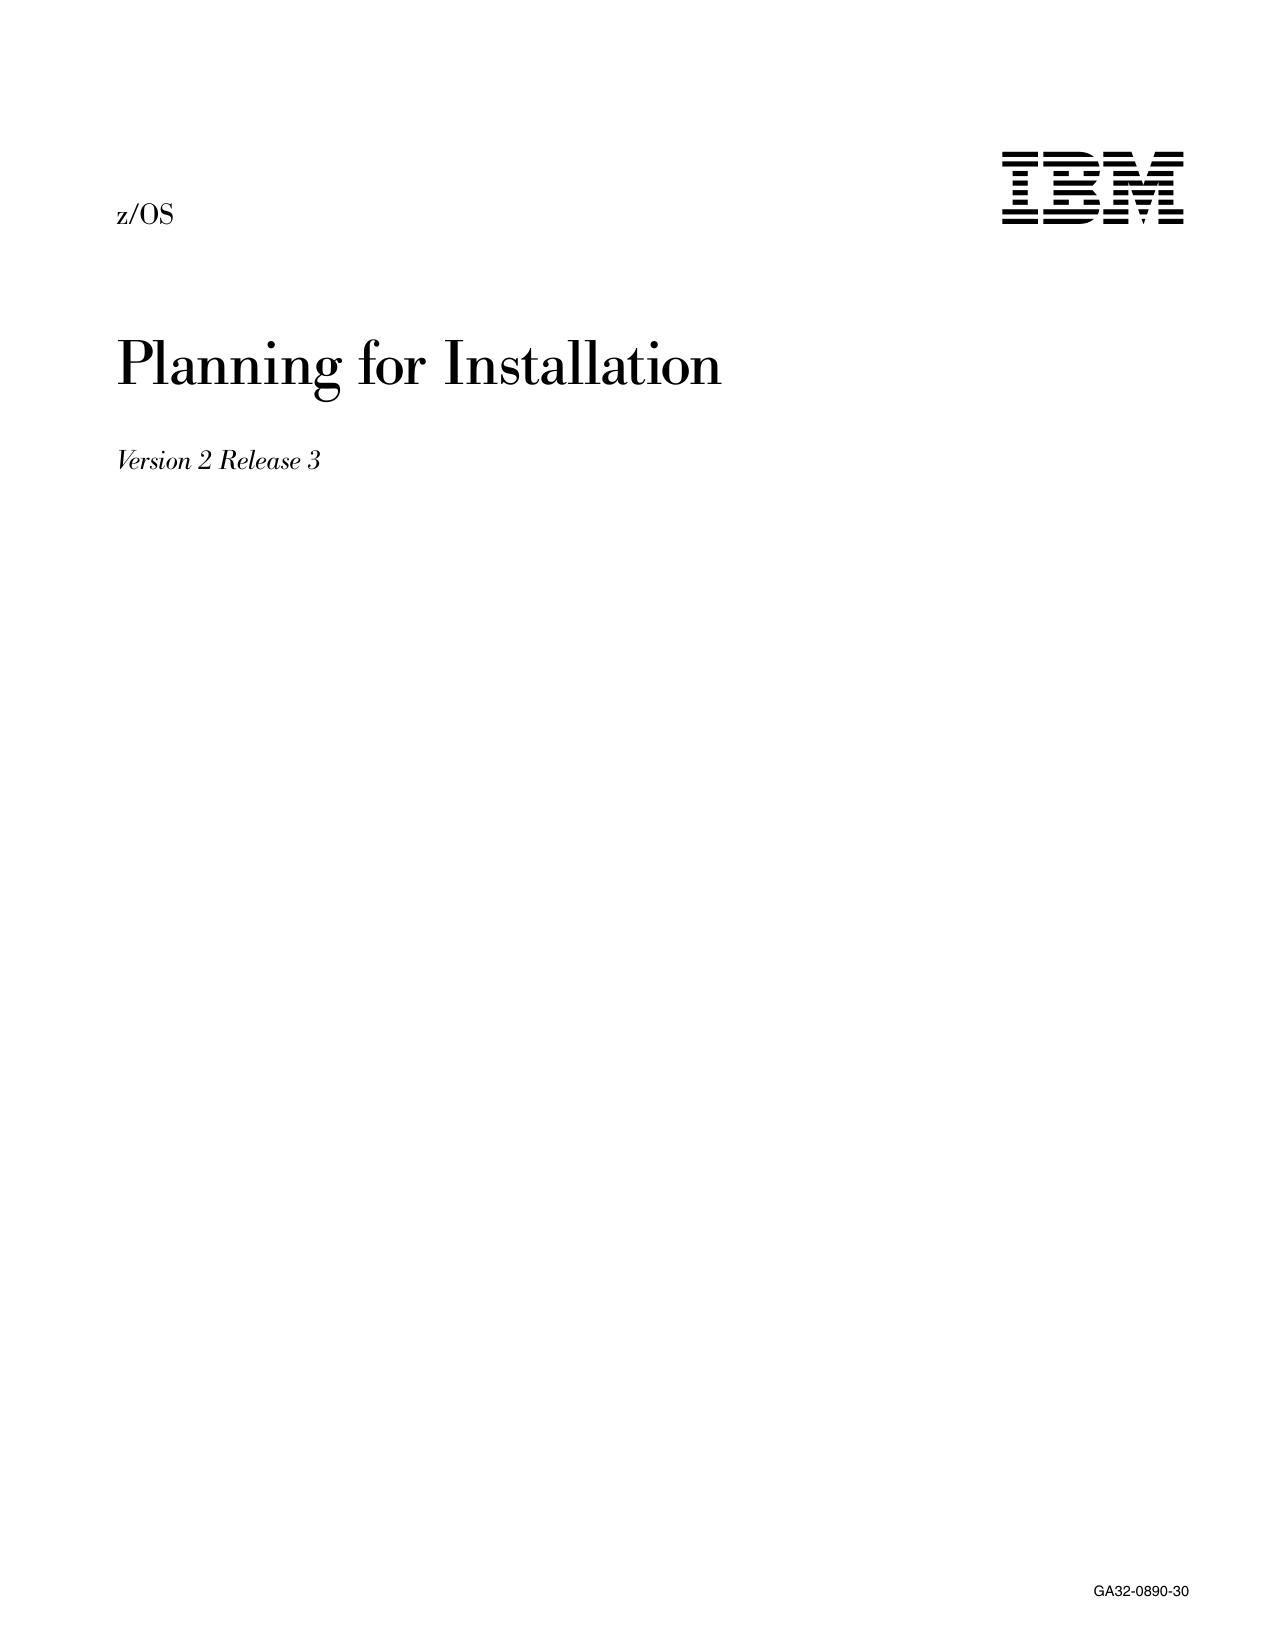 z/OS Planning for Installation | manualzz com